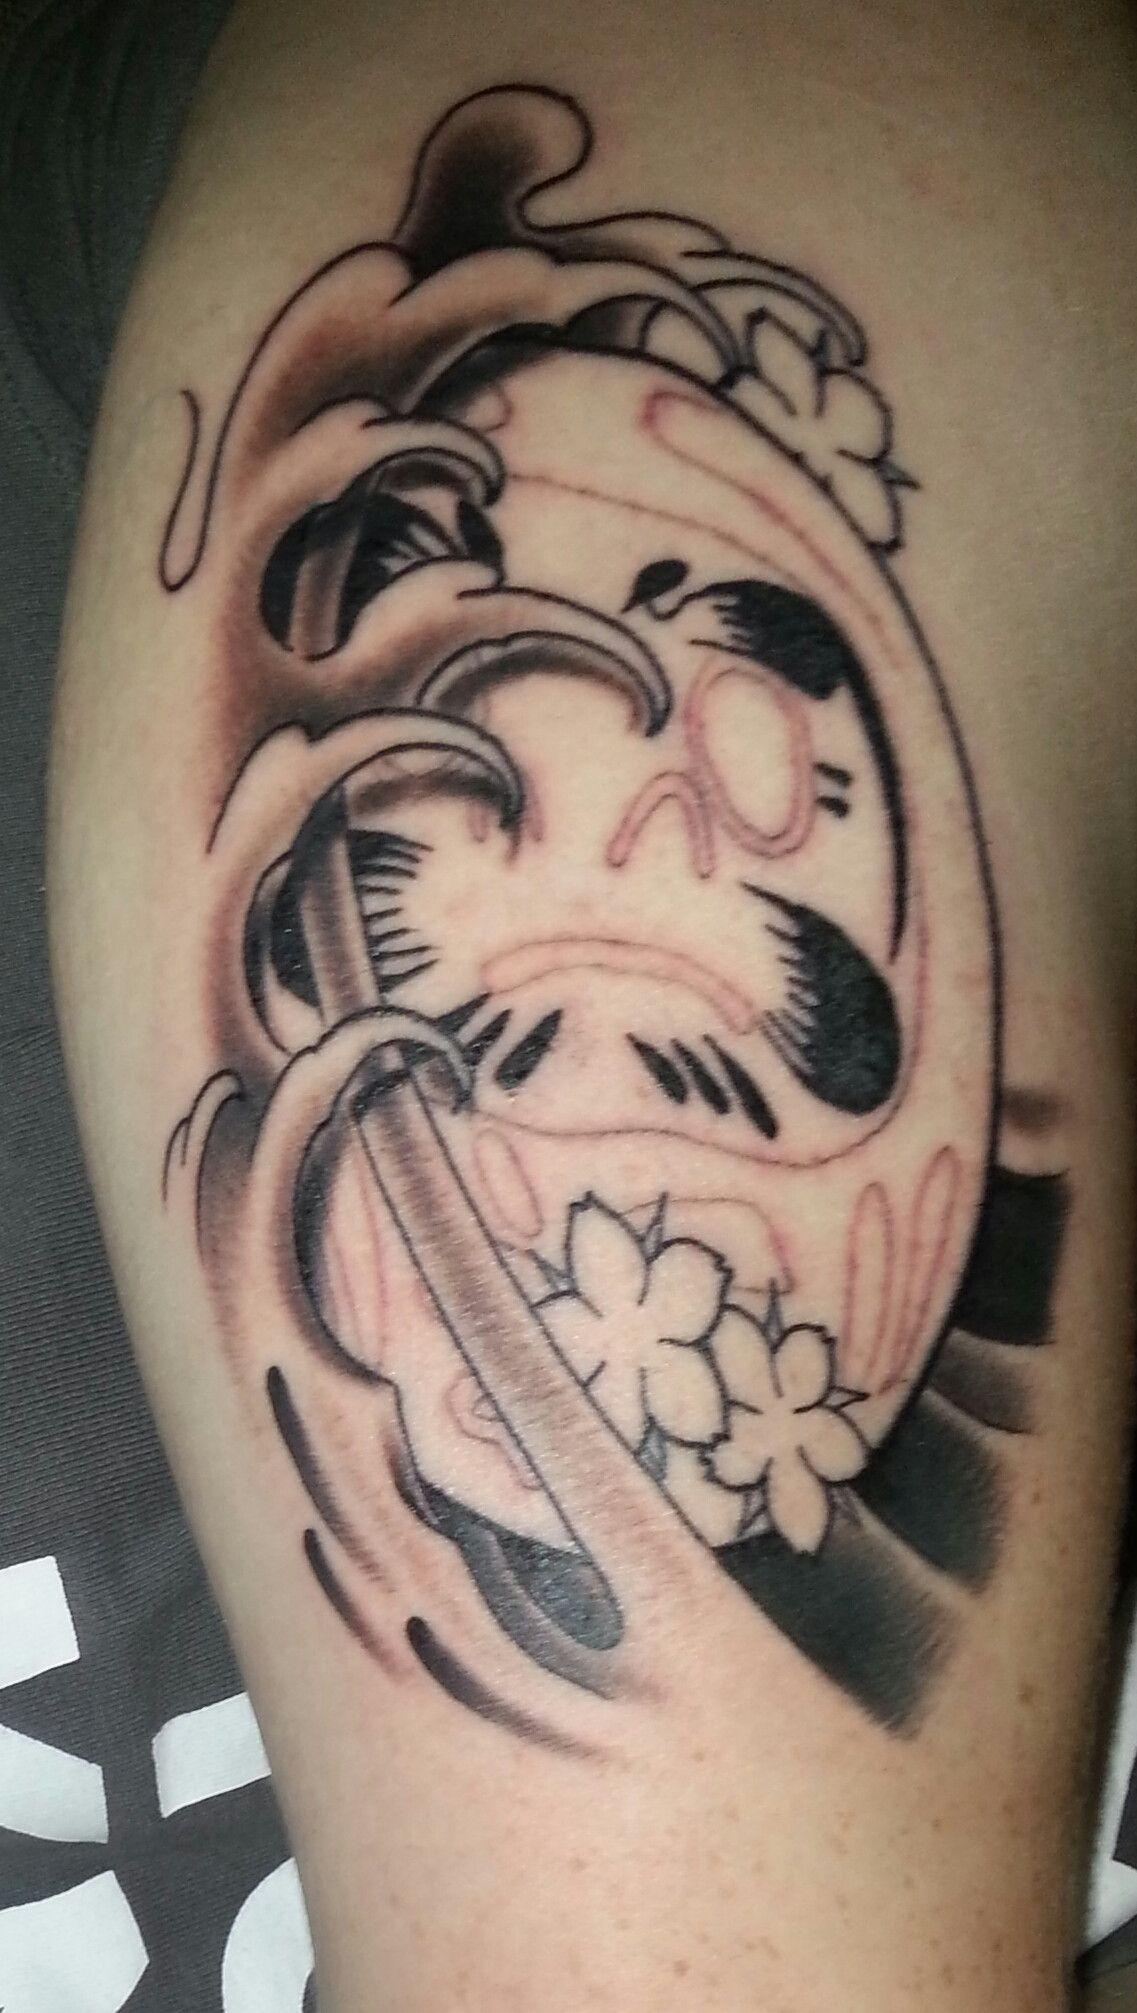 Tattoo idea 1489 my body my canvas asian art for Eau claire tattoo